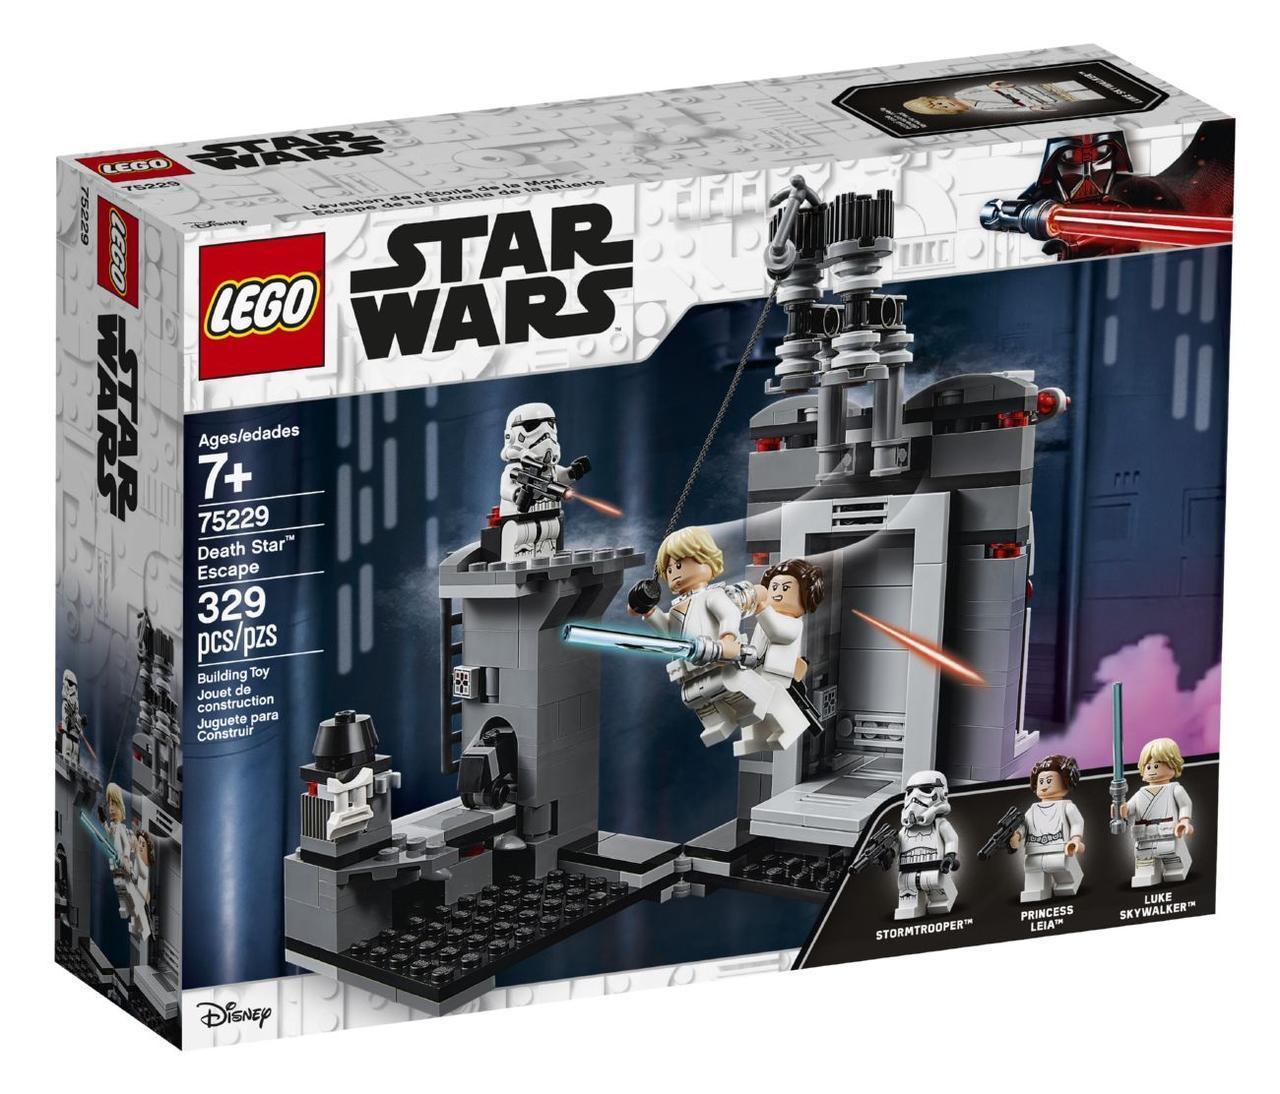 Lego Star Wars Побег со «Звезды смерти» 75229